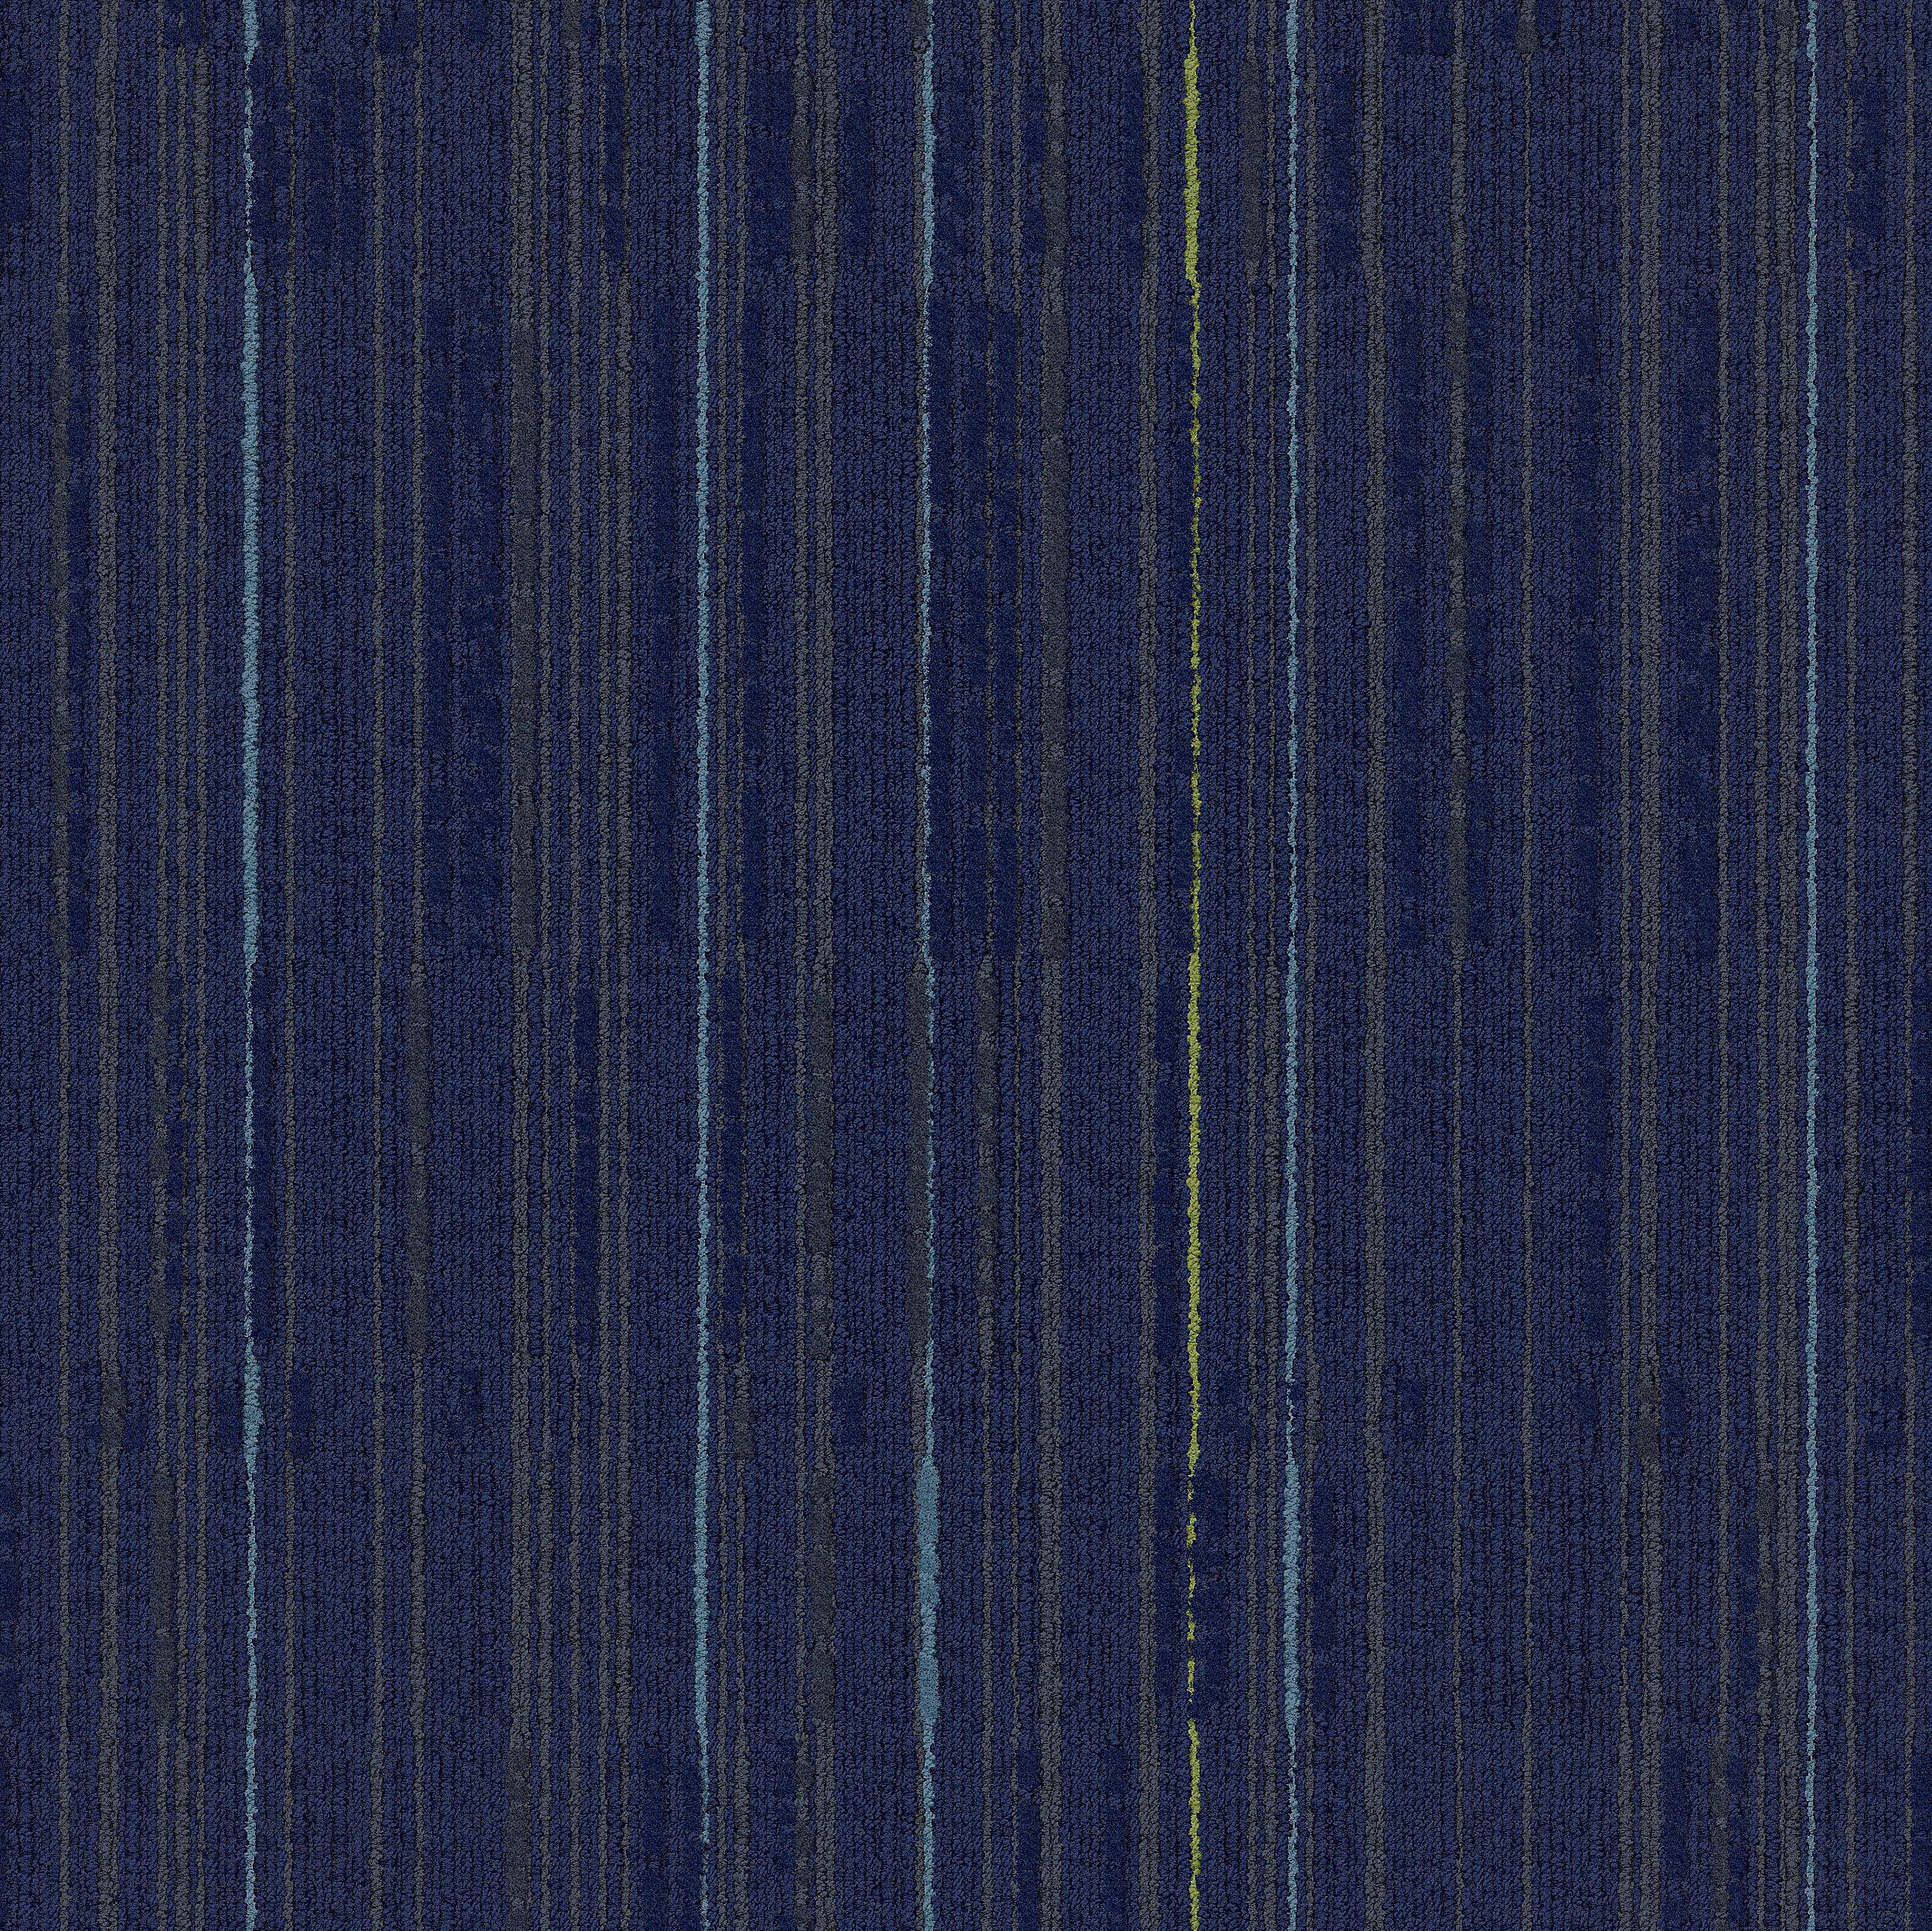 Alliteration Indigo Asparagus Carpet Tiles From